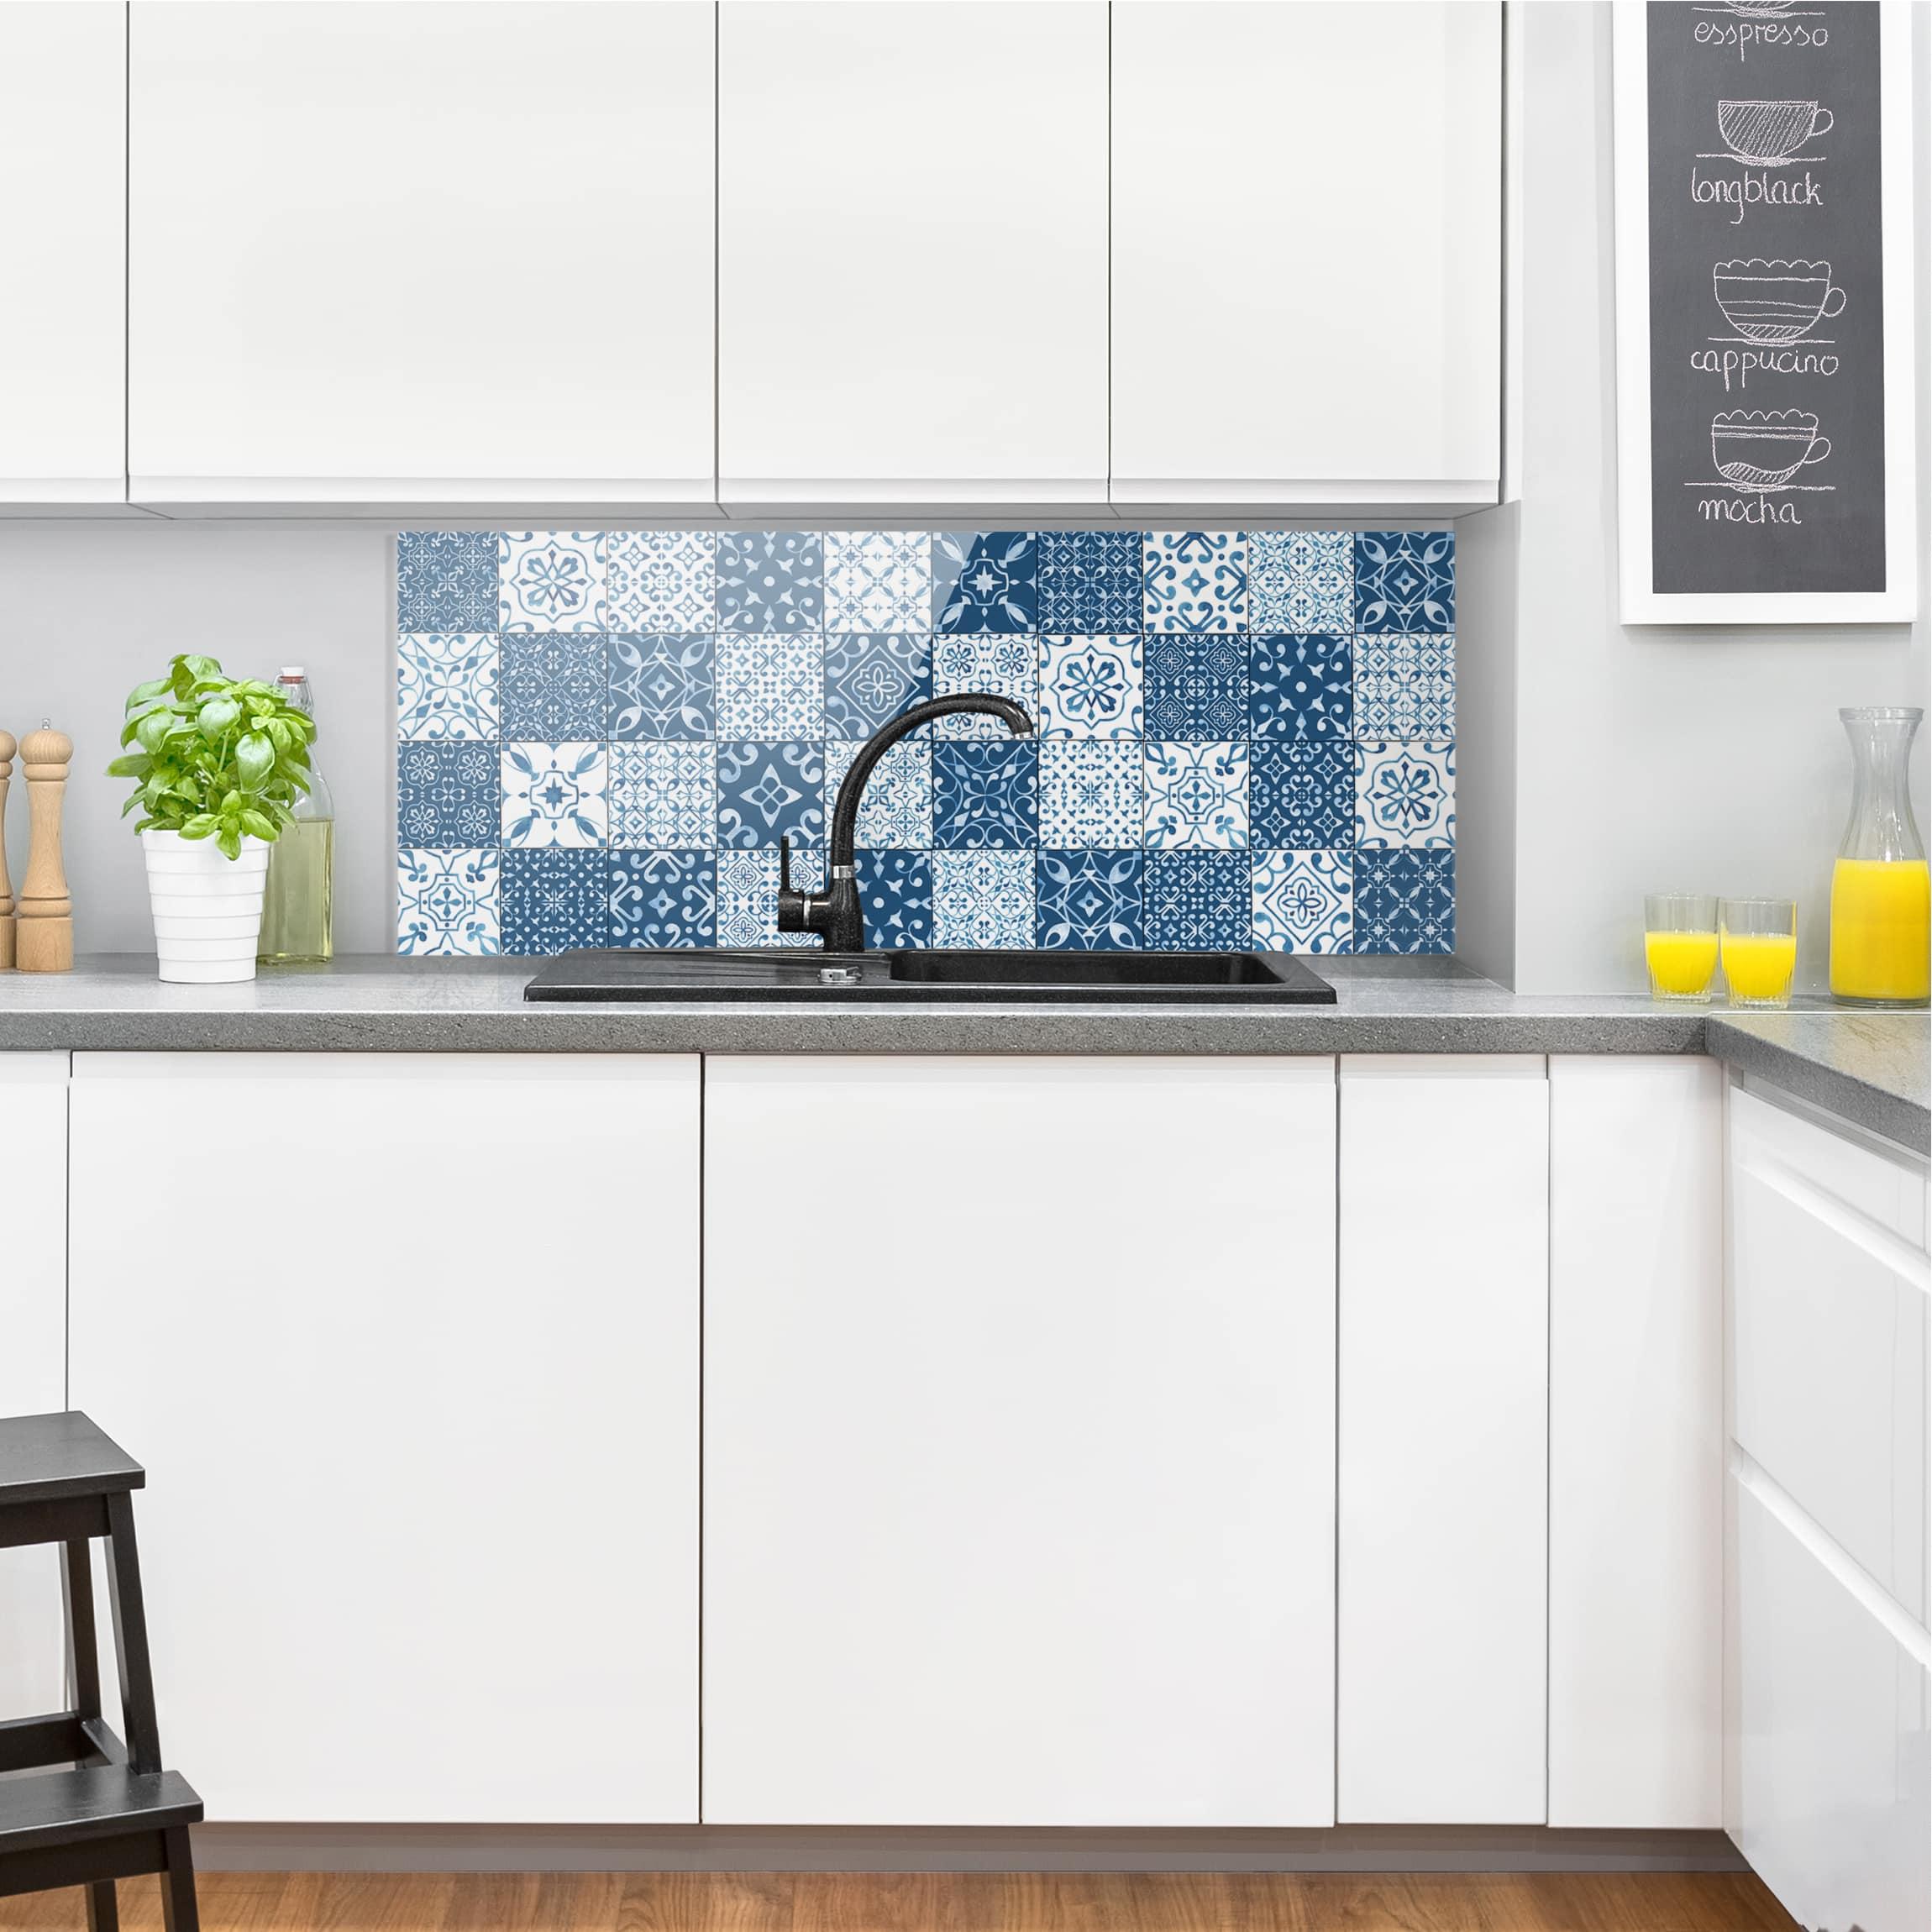 spritzschutz glas fliesen mustermix blau wei panorama. Black Bedroom Furniture Sets. Home Design Ideas